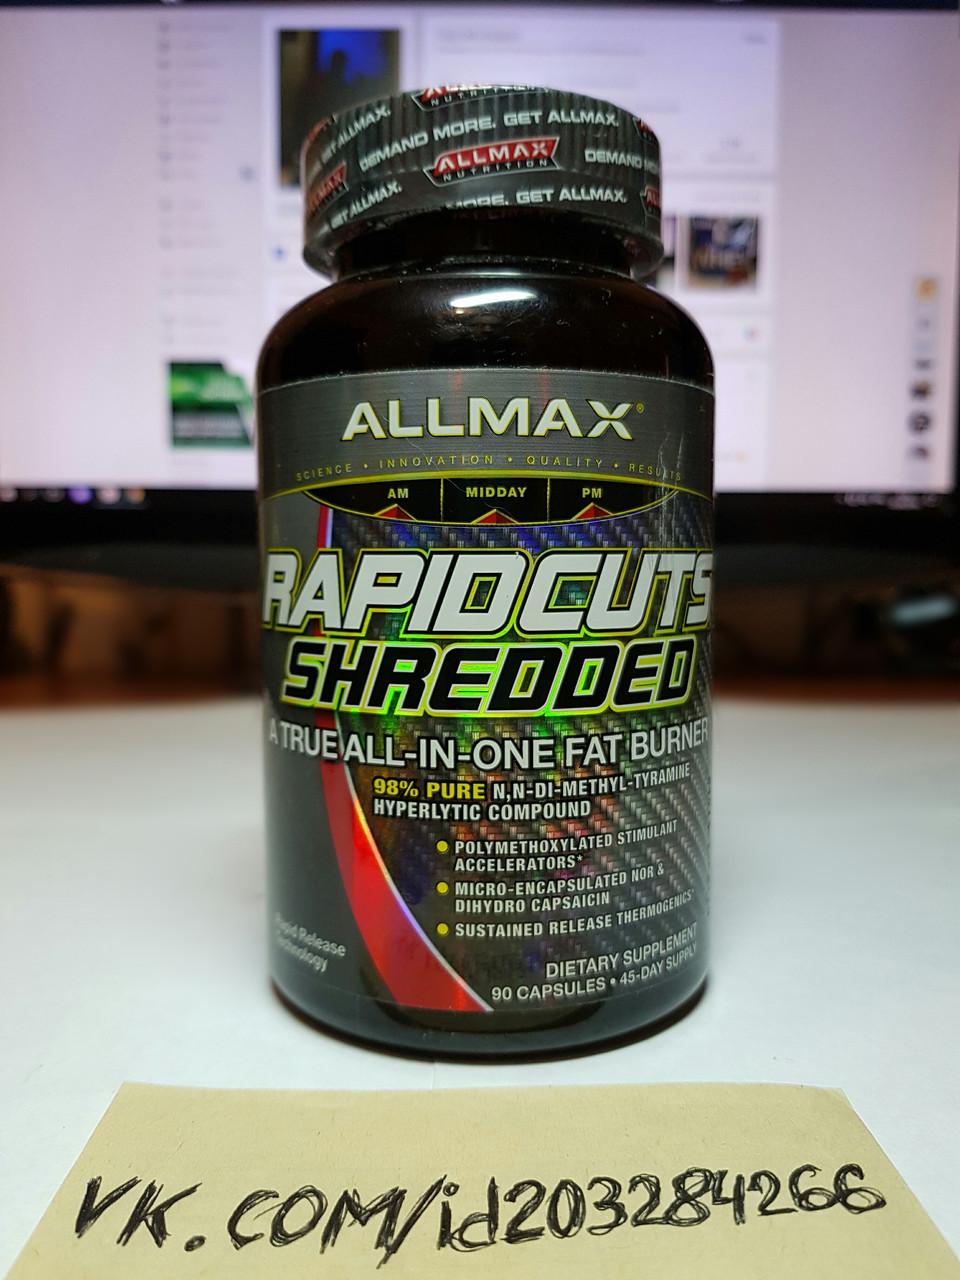 AllMax Rapidcuts Shredded 90 капсул